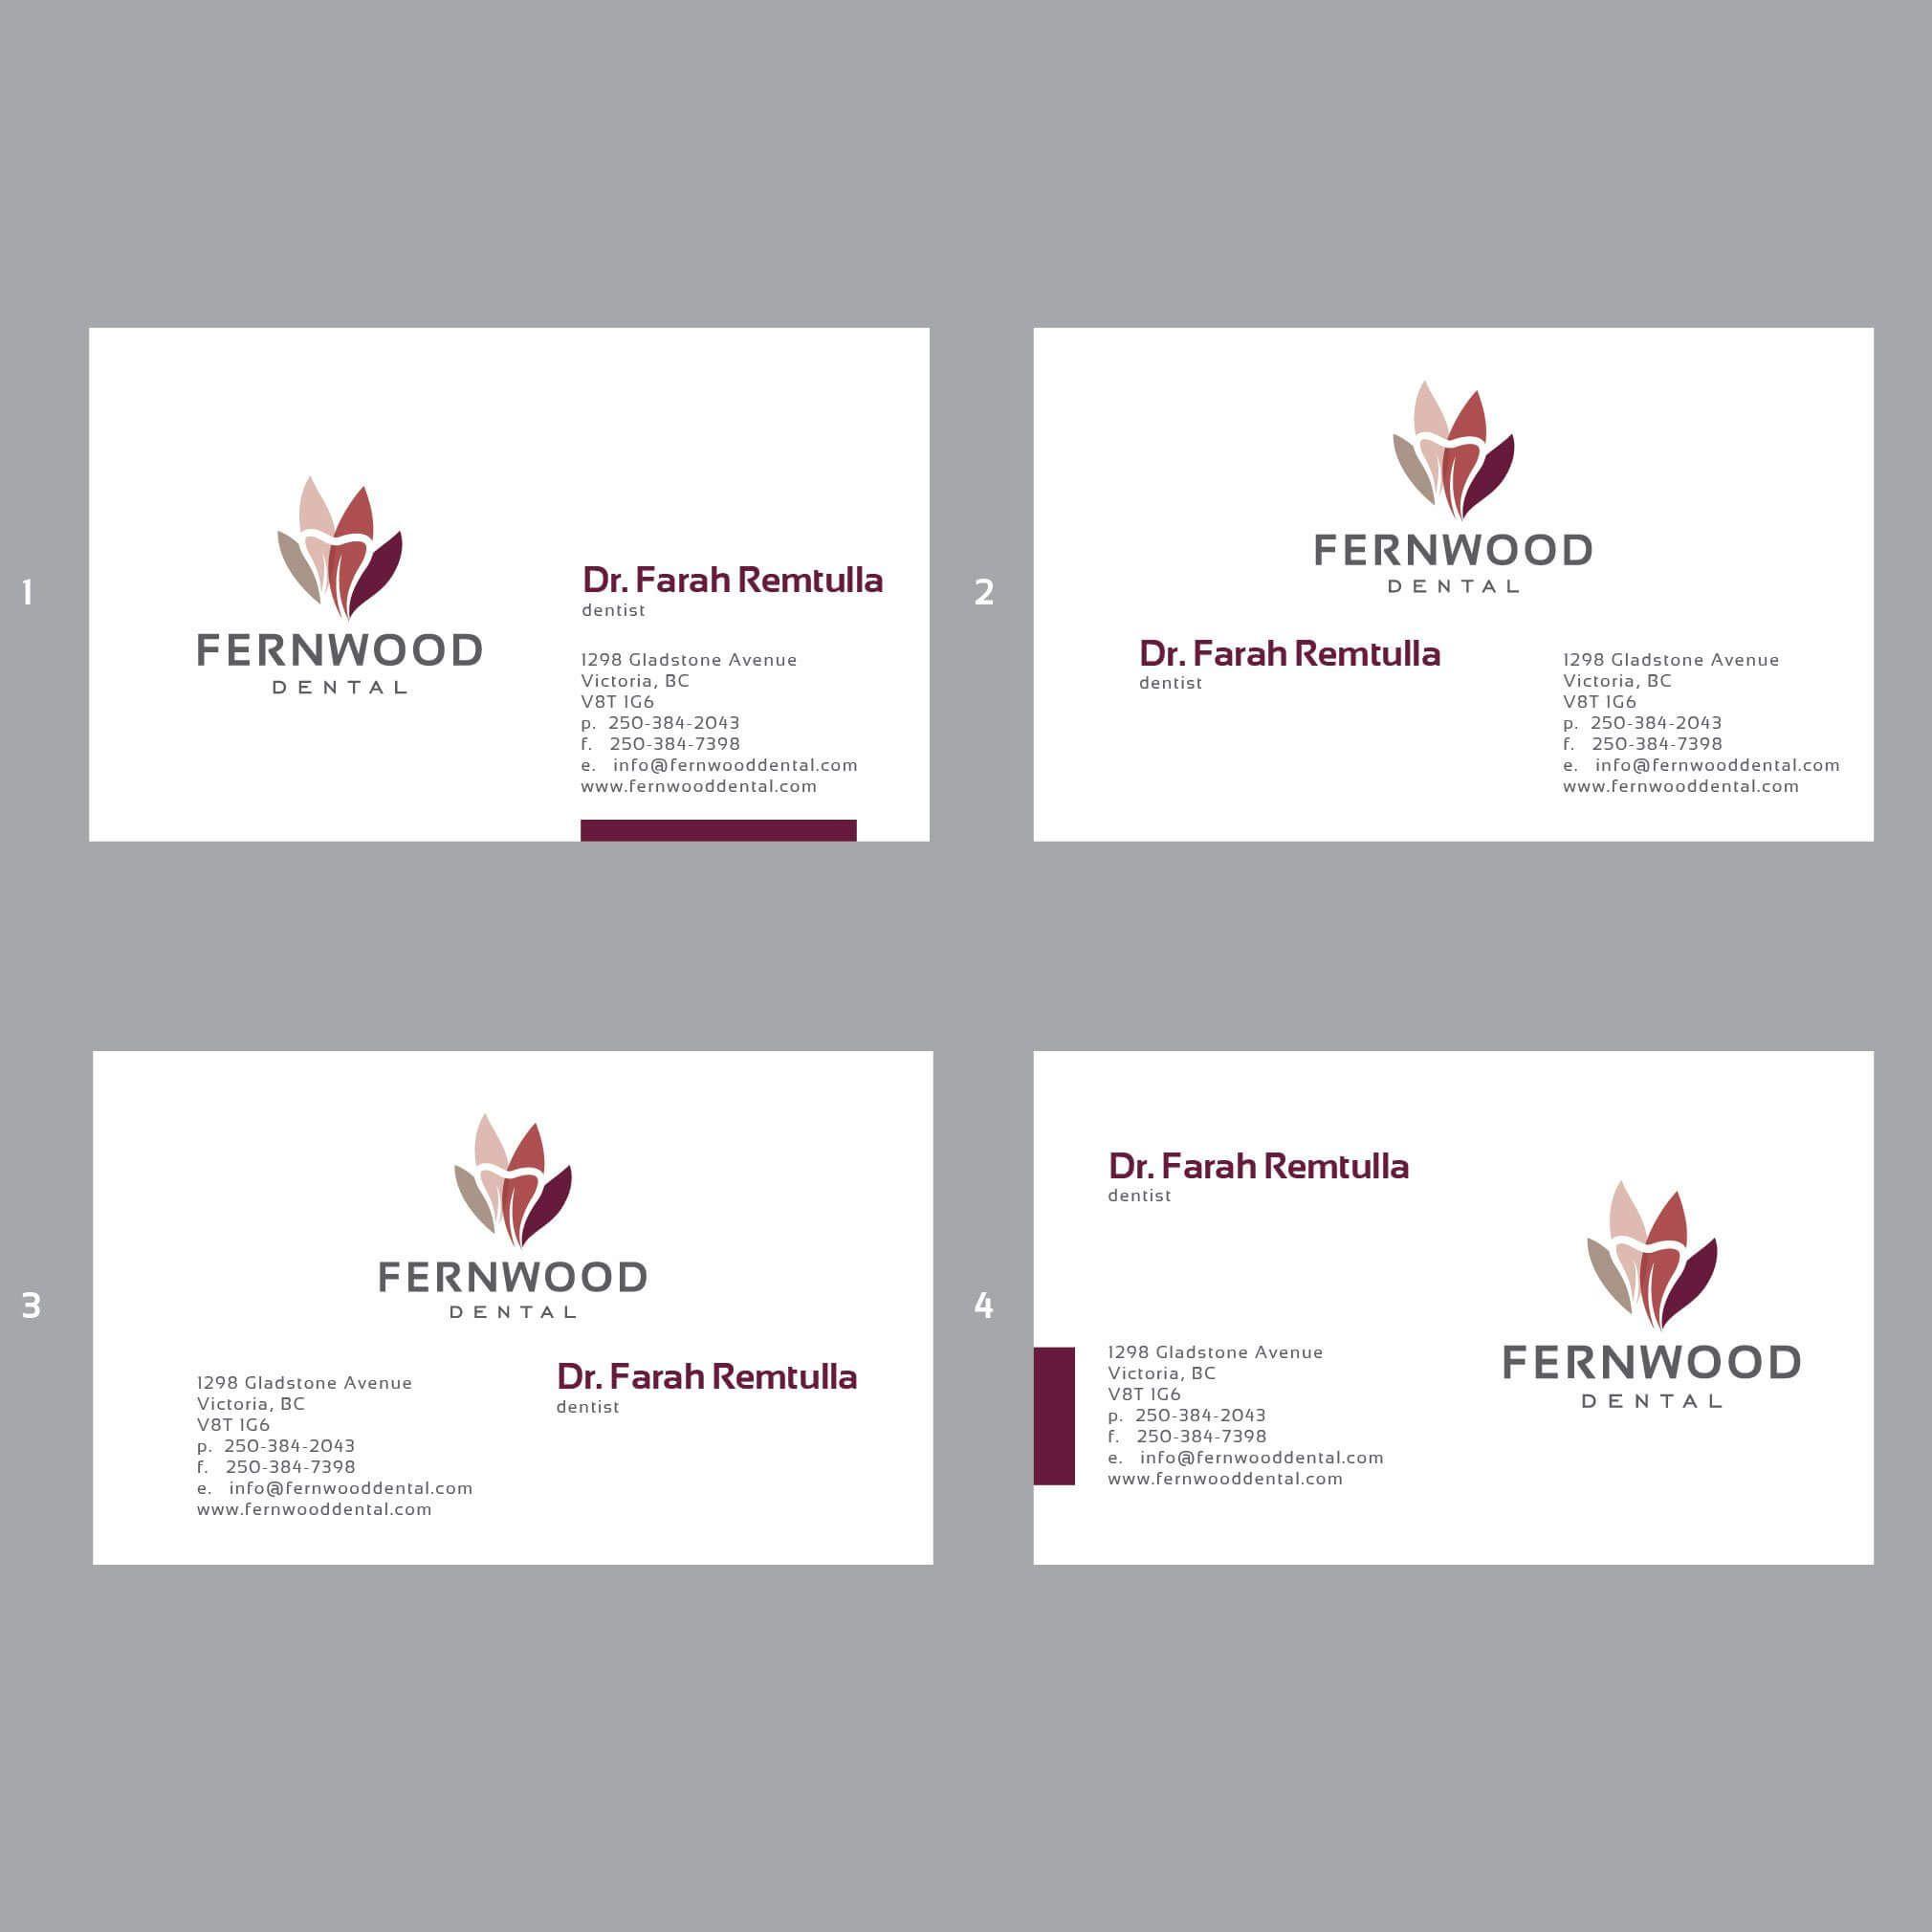 Business Card Design Custom Online Business Cards In Generic Business Card Template Entrepreneur Business Cards Business Card Template Business Card Design